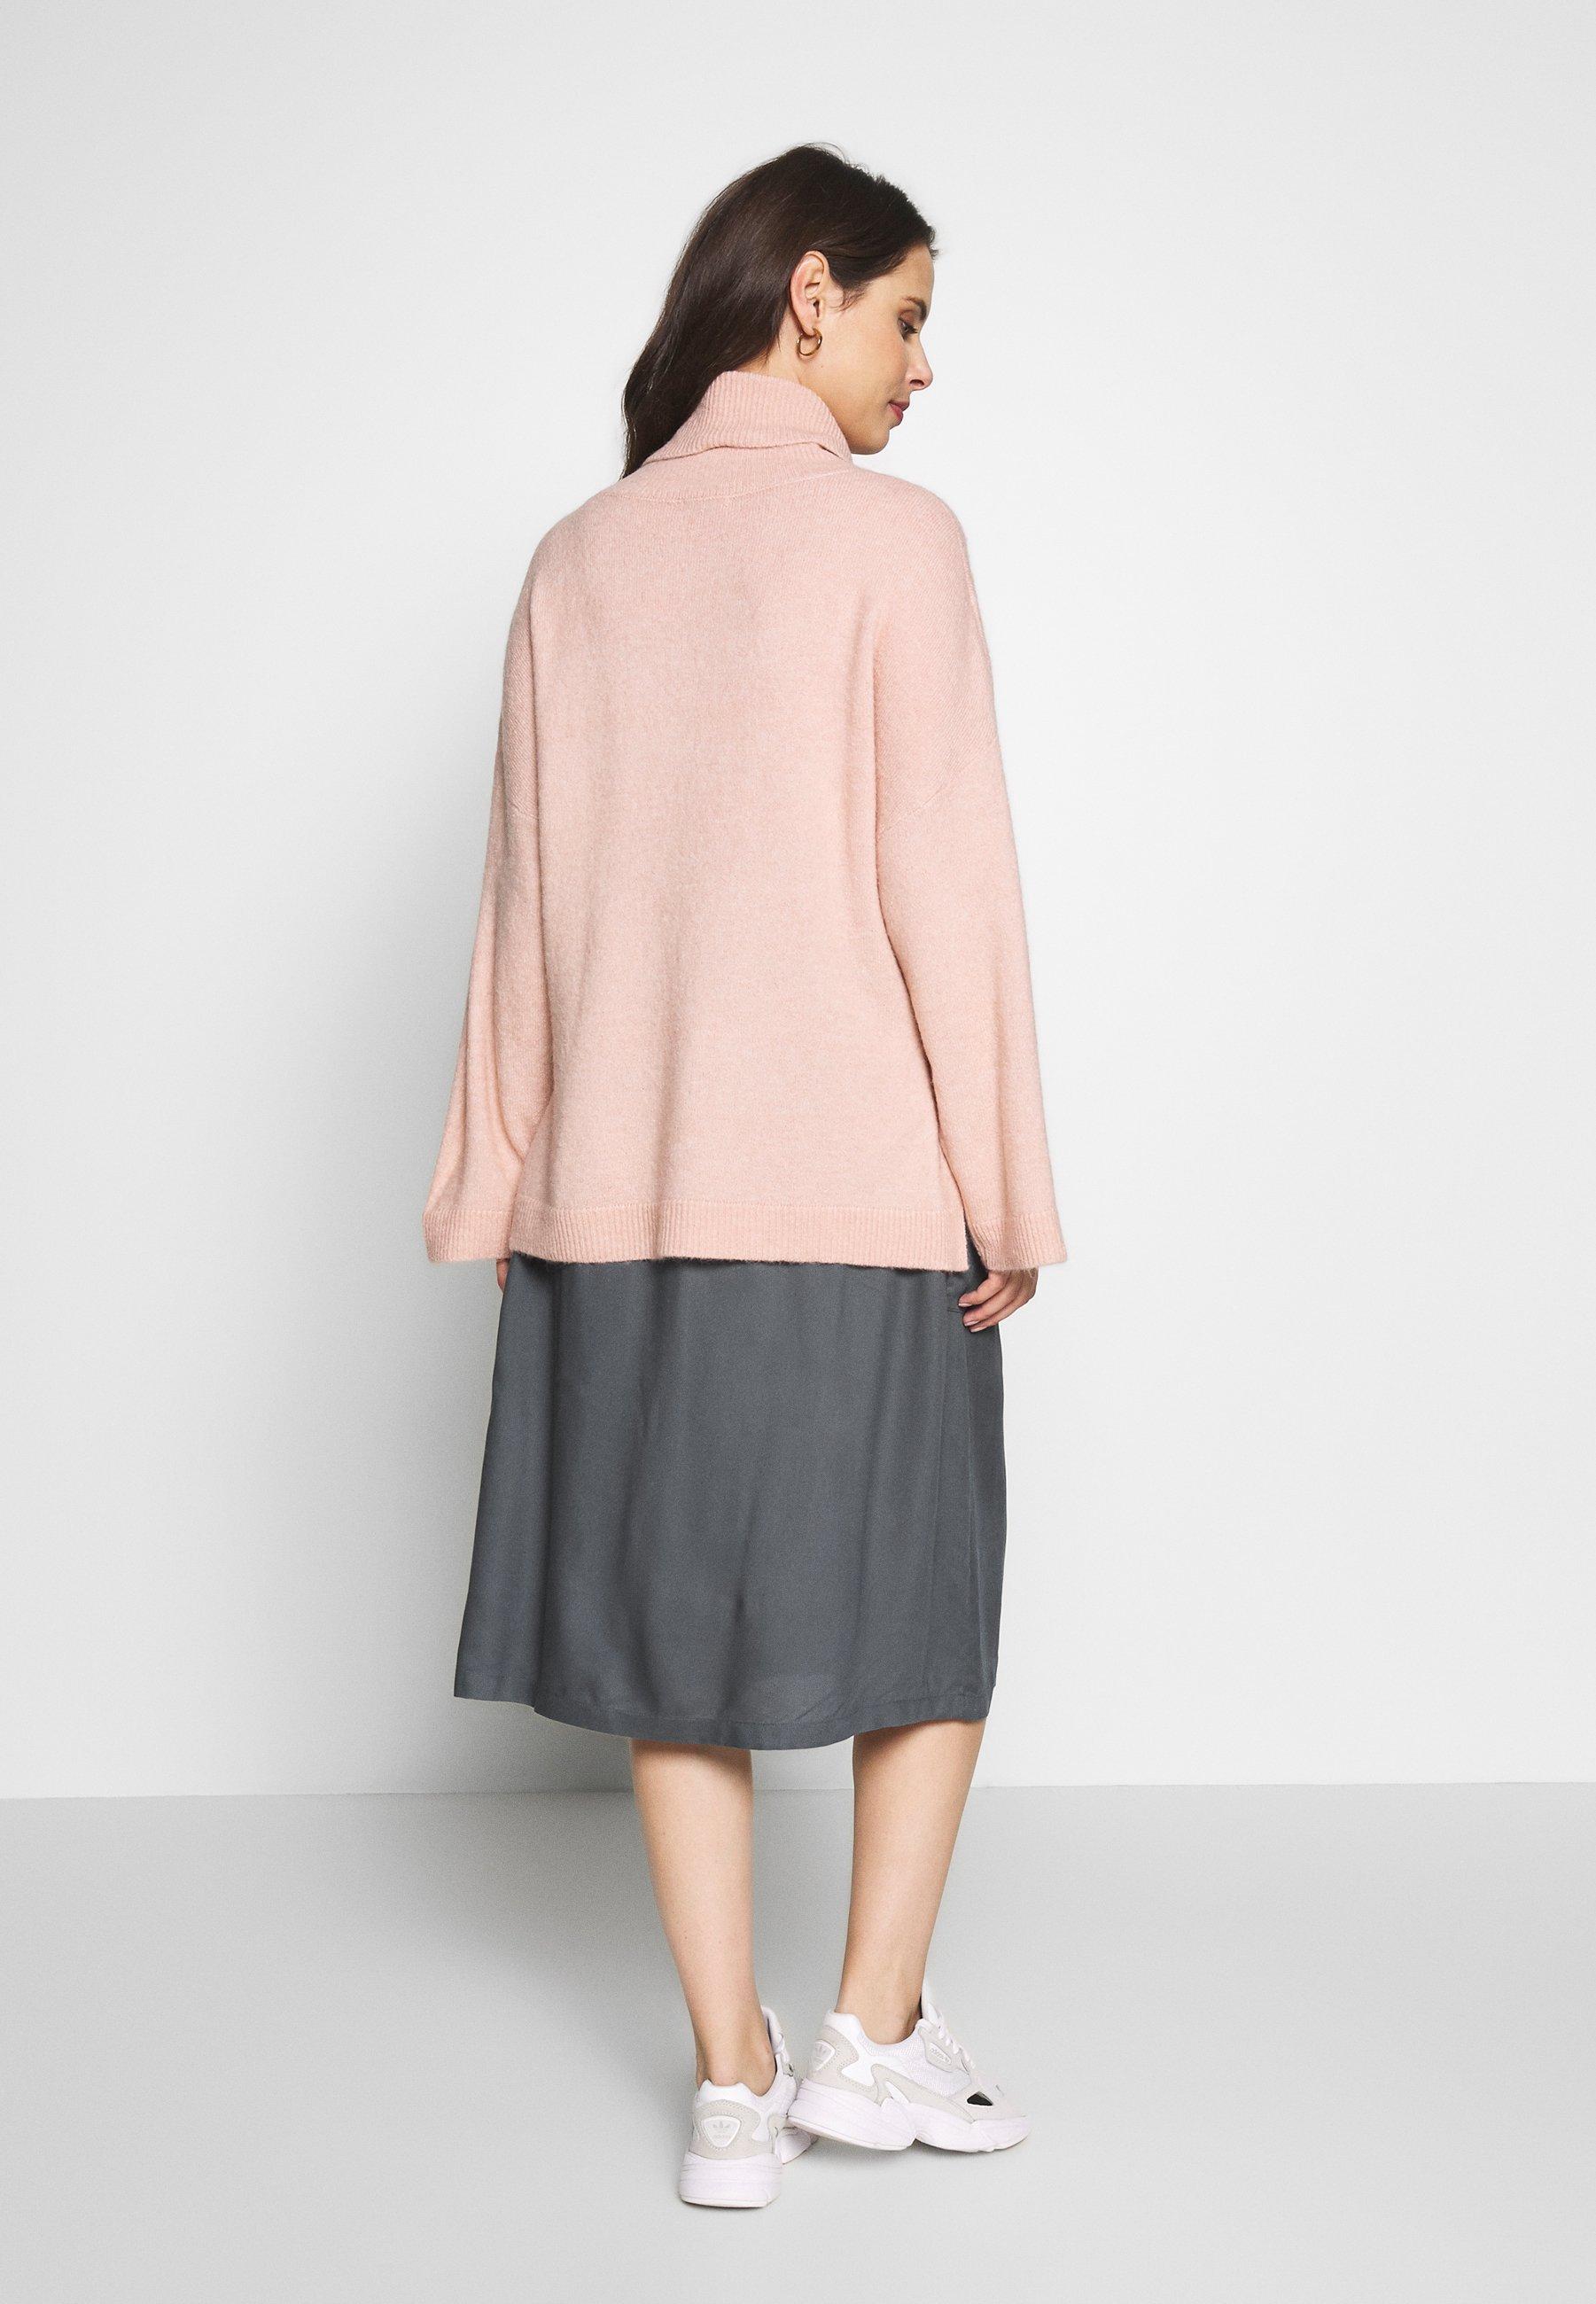 Mamalicious Mlmalin Skirt - A-lijn Rok Orion Blue jaUZsPrK